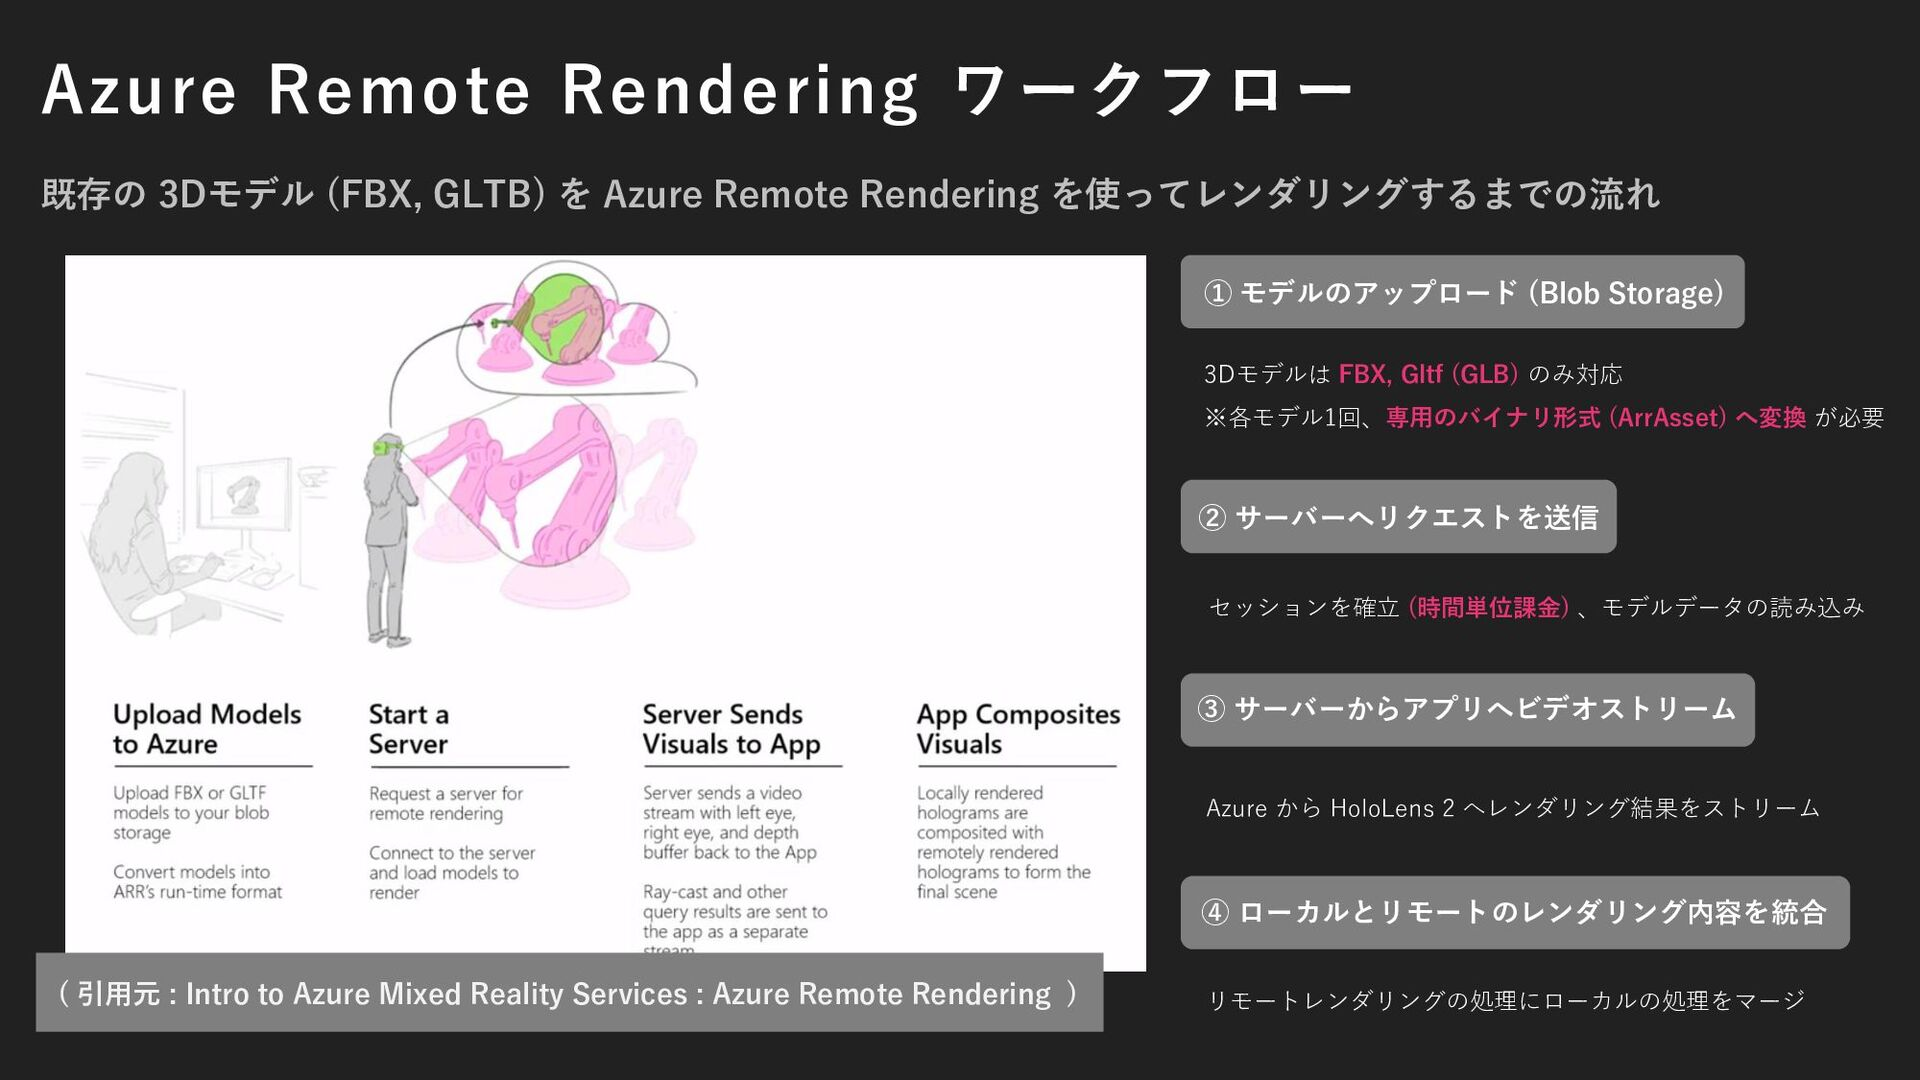 Azure Remote Rendering ワークフロー 既存の 3Dモデル (FBX, G...